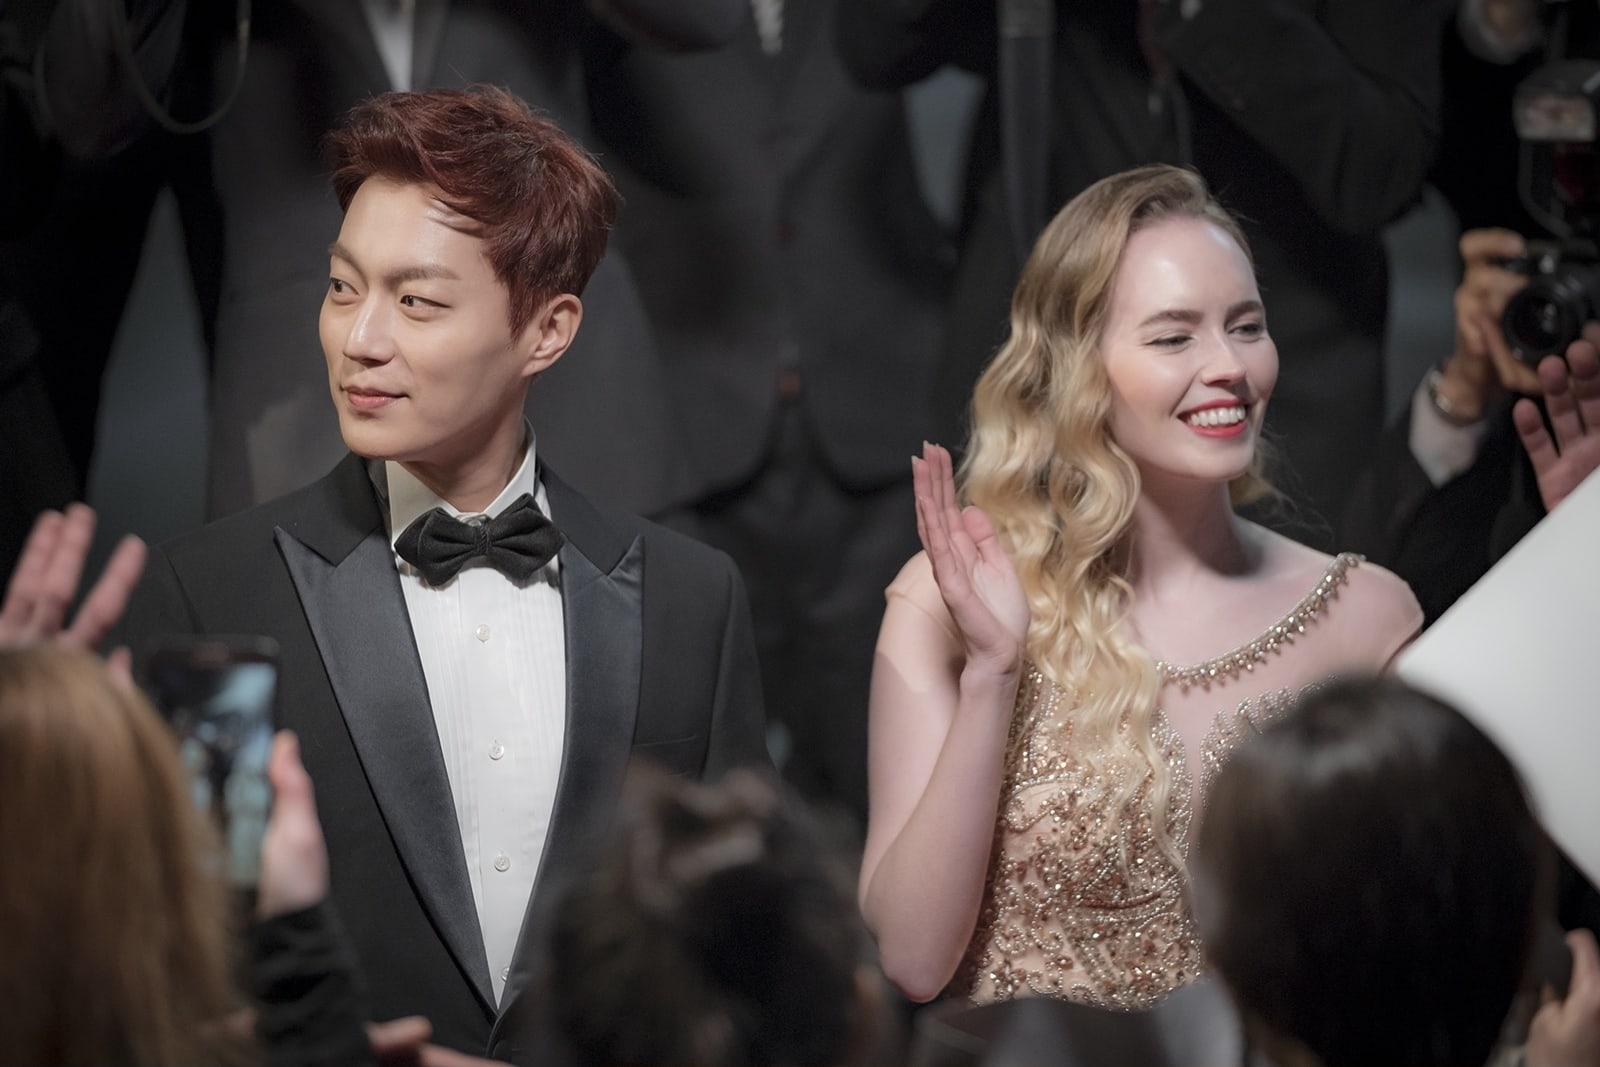 https://0.soompi.io/wp-content/uploads/2018/01/08173559/Yoon-Doojoon-2.jpg